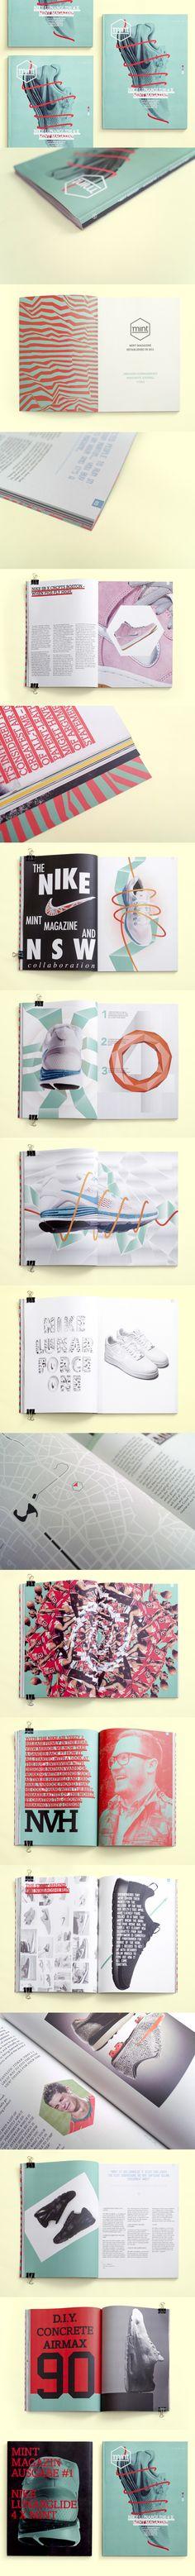 MINT Magazine // Sneaker Magazine by Jonas Möllenbeck